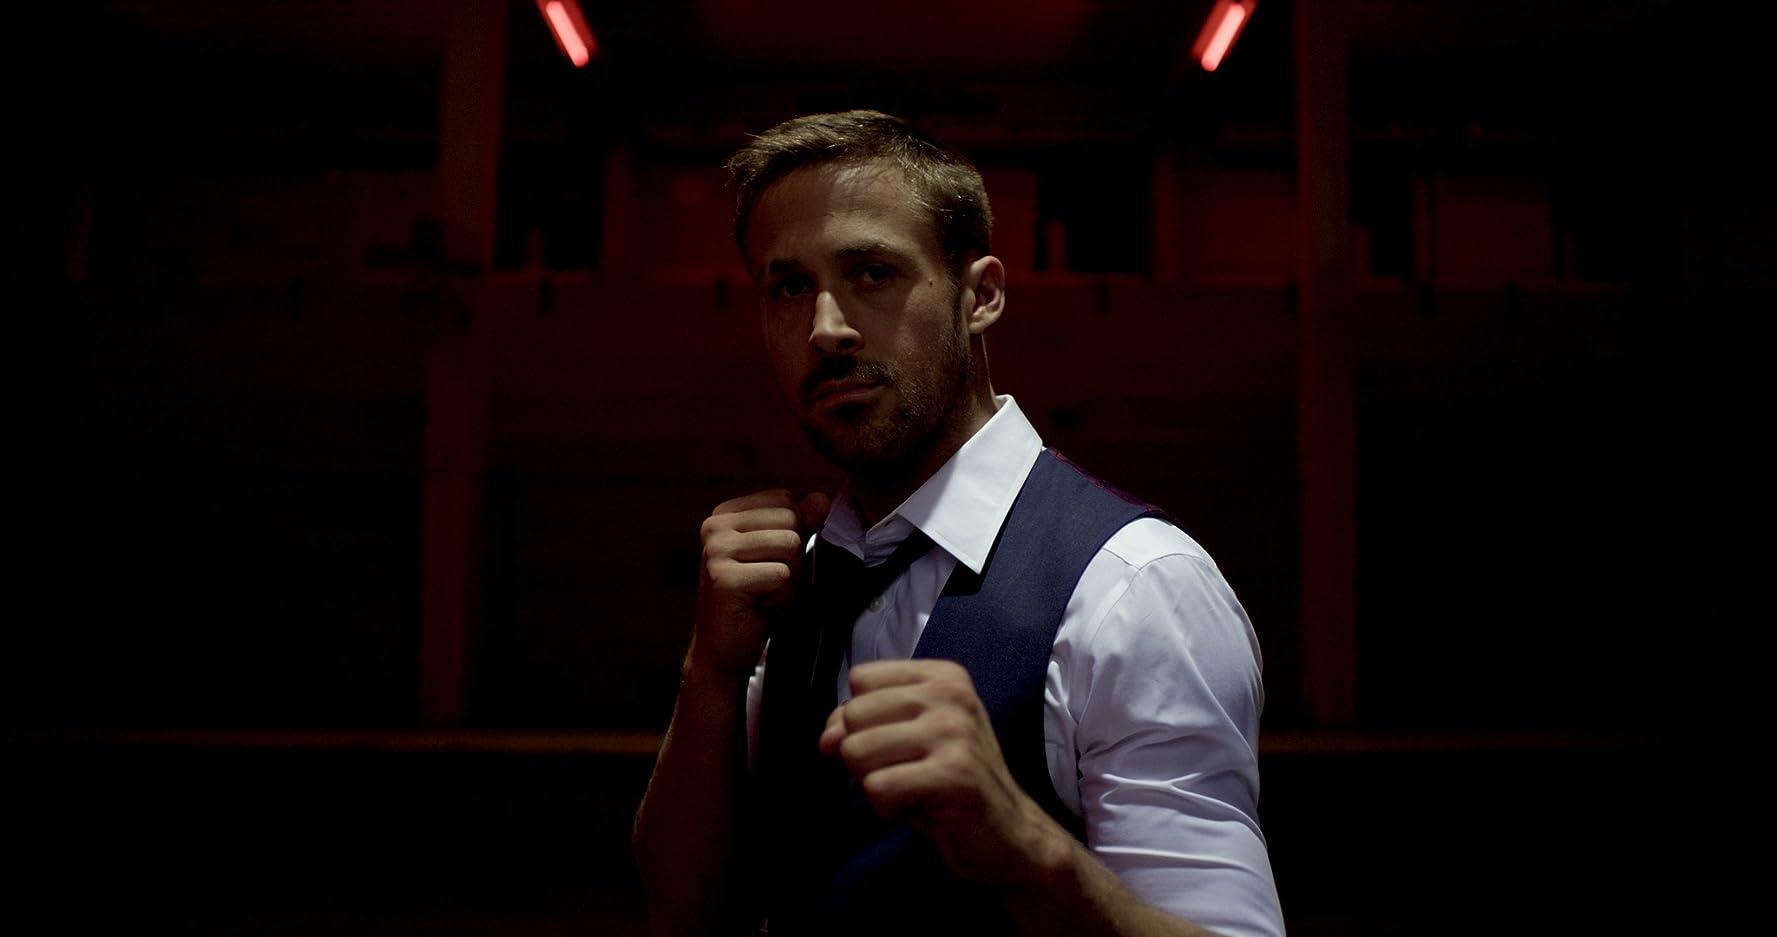 Ryan Gosling in Only God Forgives (2013)